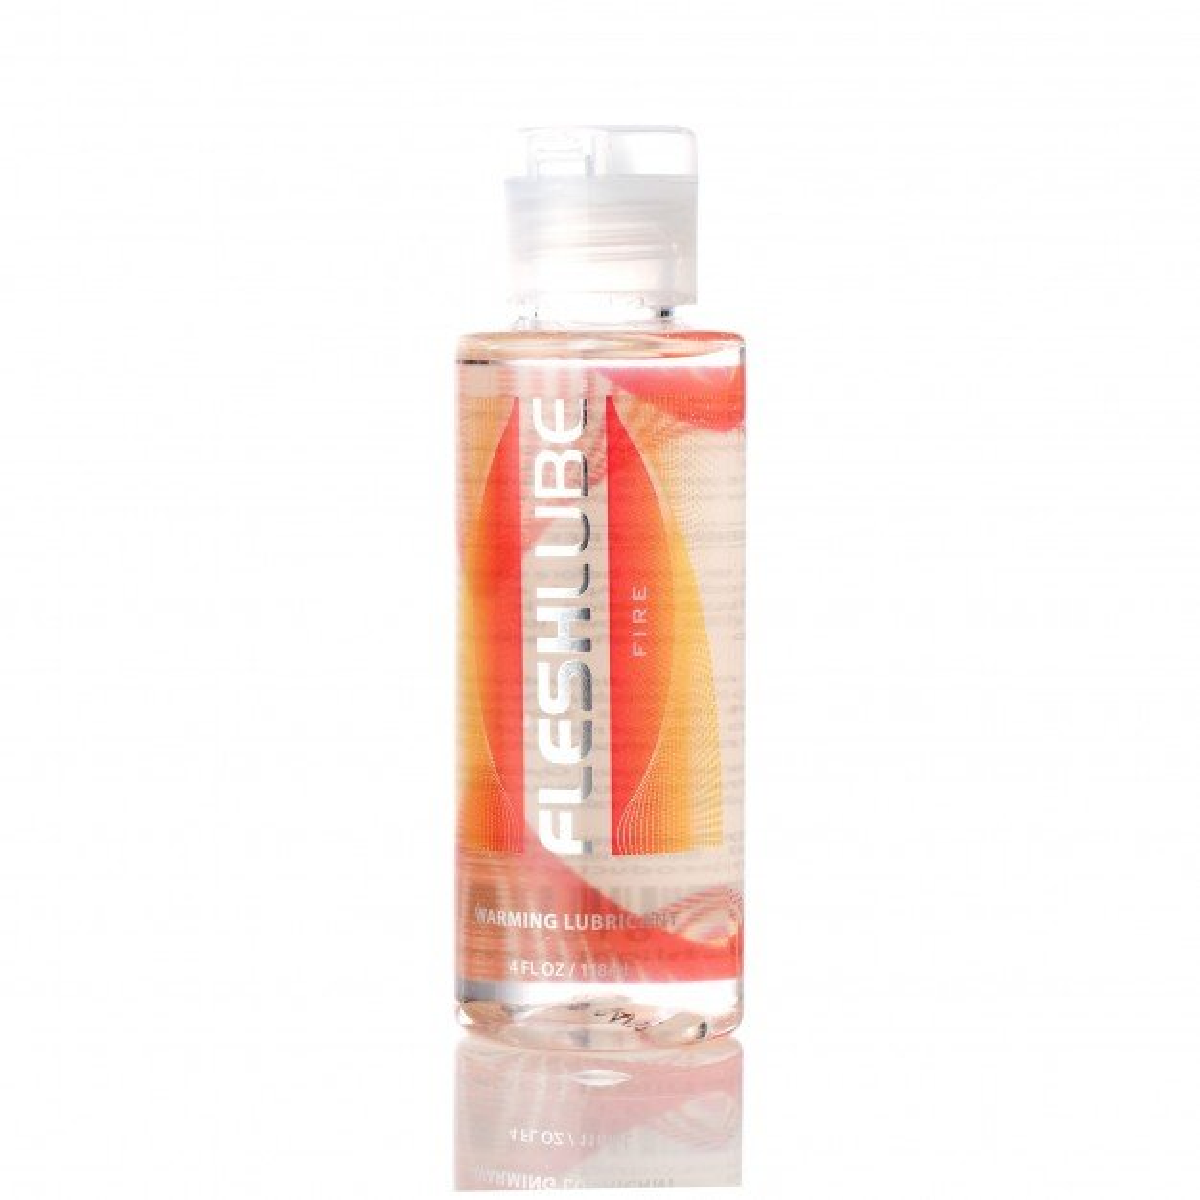 Fleshlight Fleshlube Fire 100 ml, lubrikant na vodní bázi